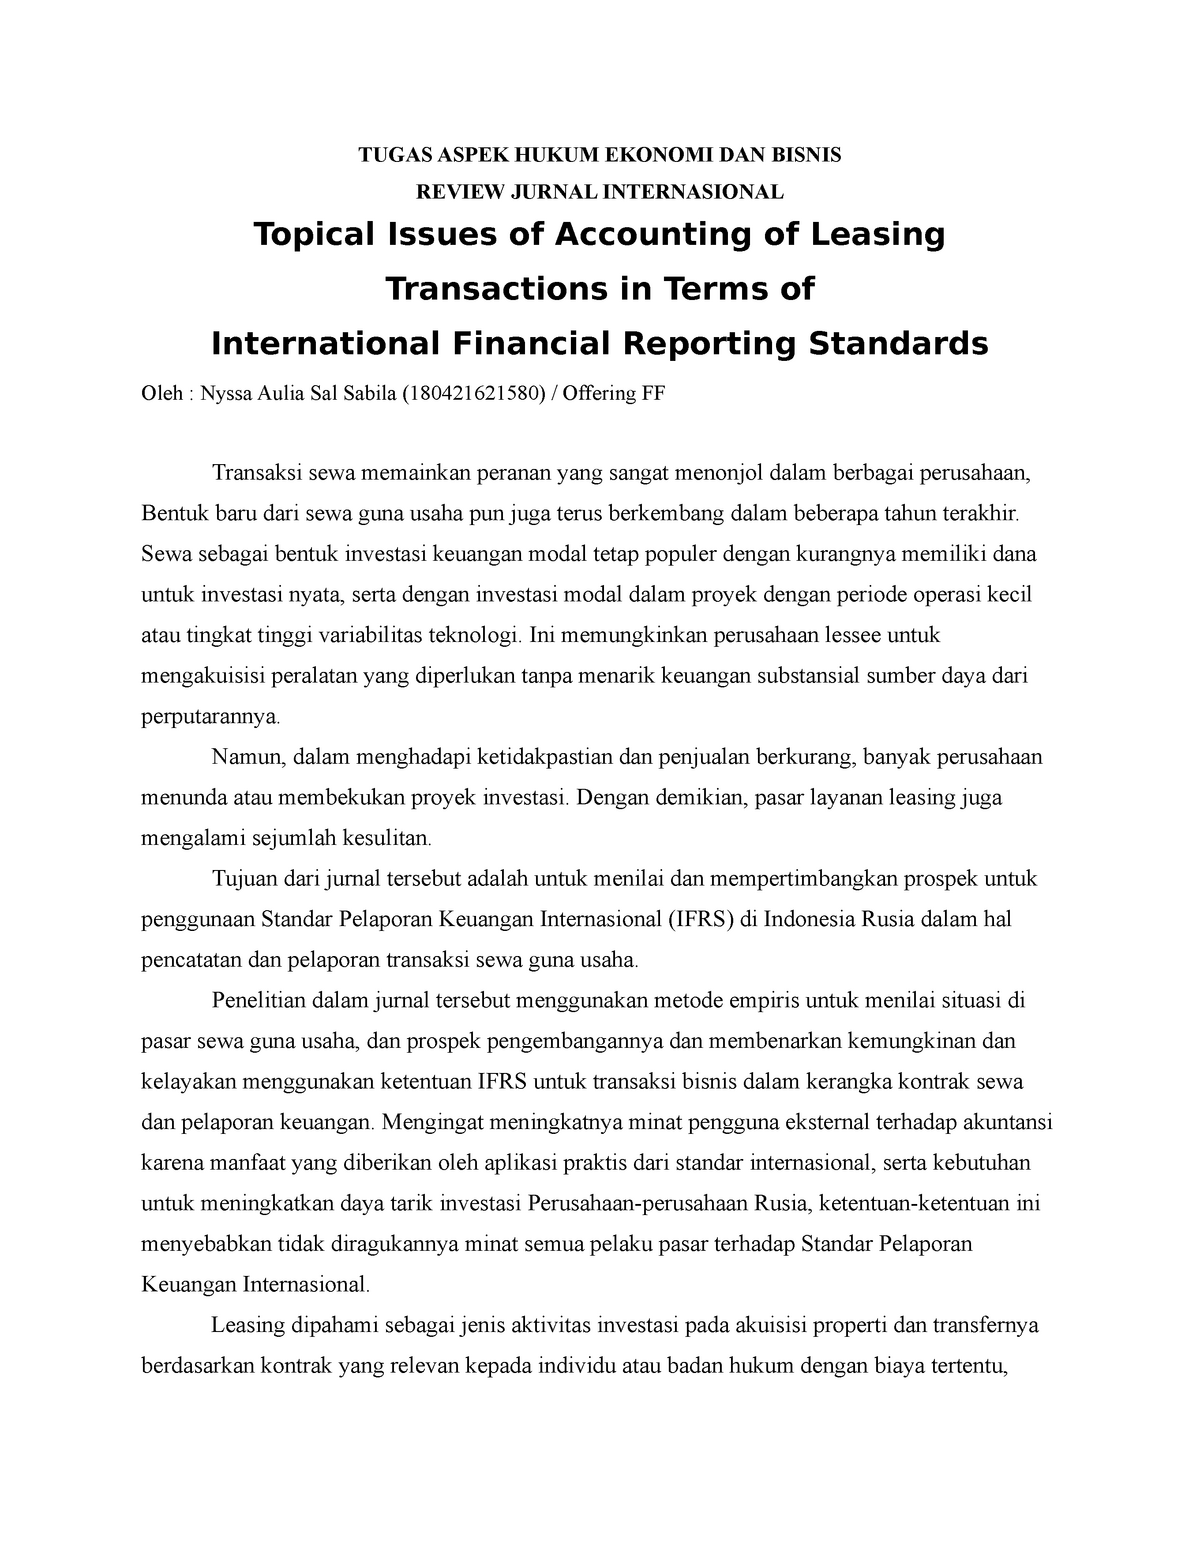 Analisis Pendidikan Umpk607 Um Studocu